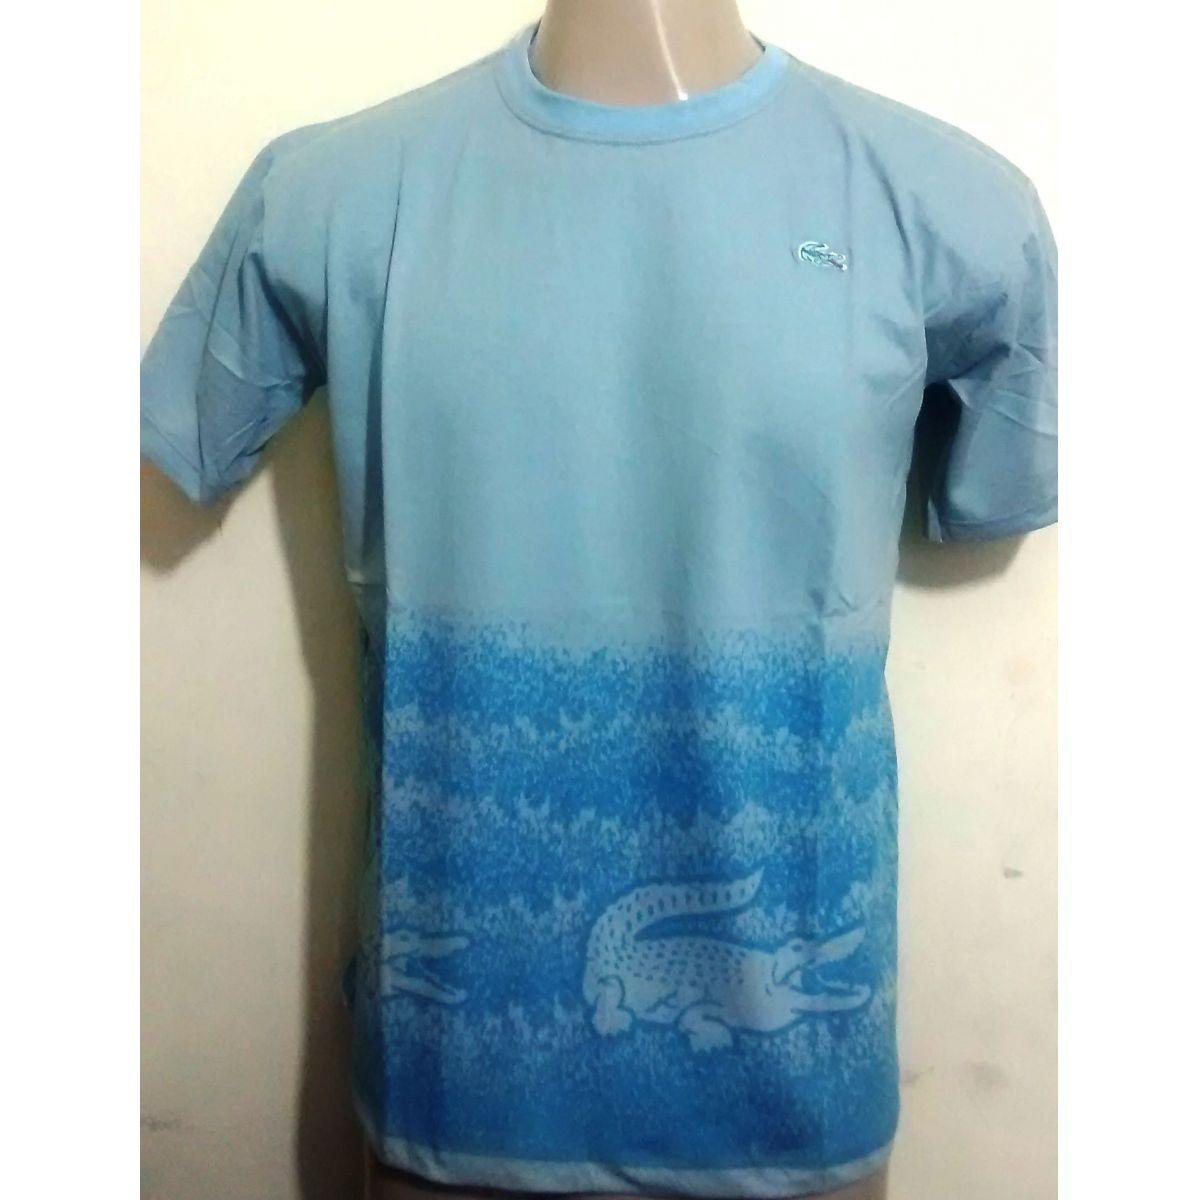 Kit C/ 50 Camisetas Masculinas Diversas Marcas